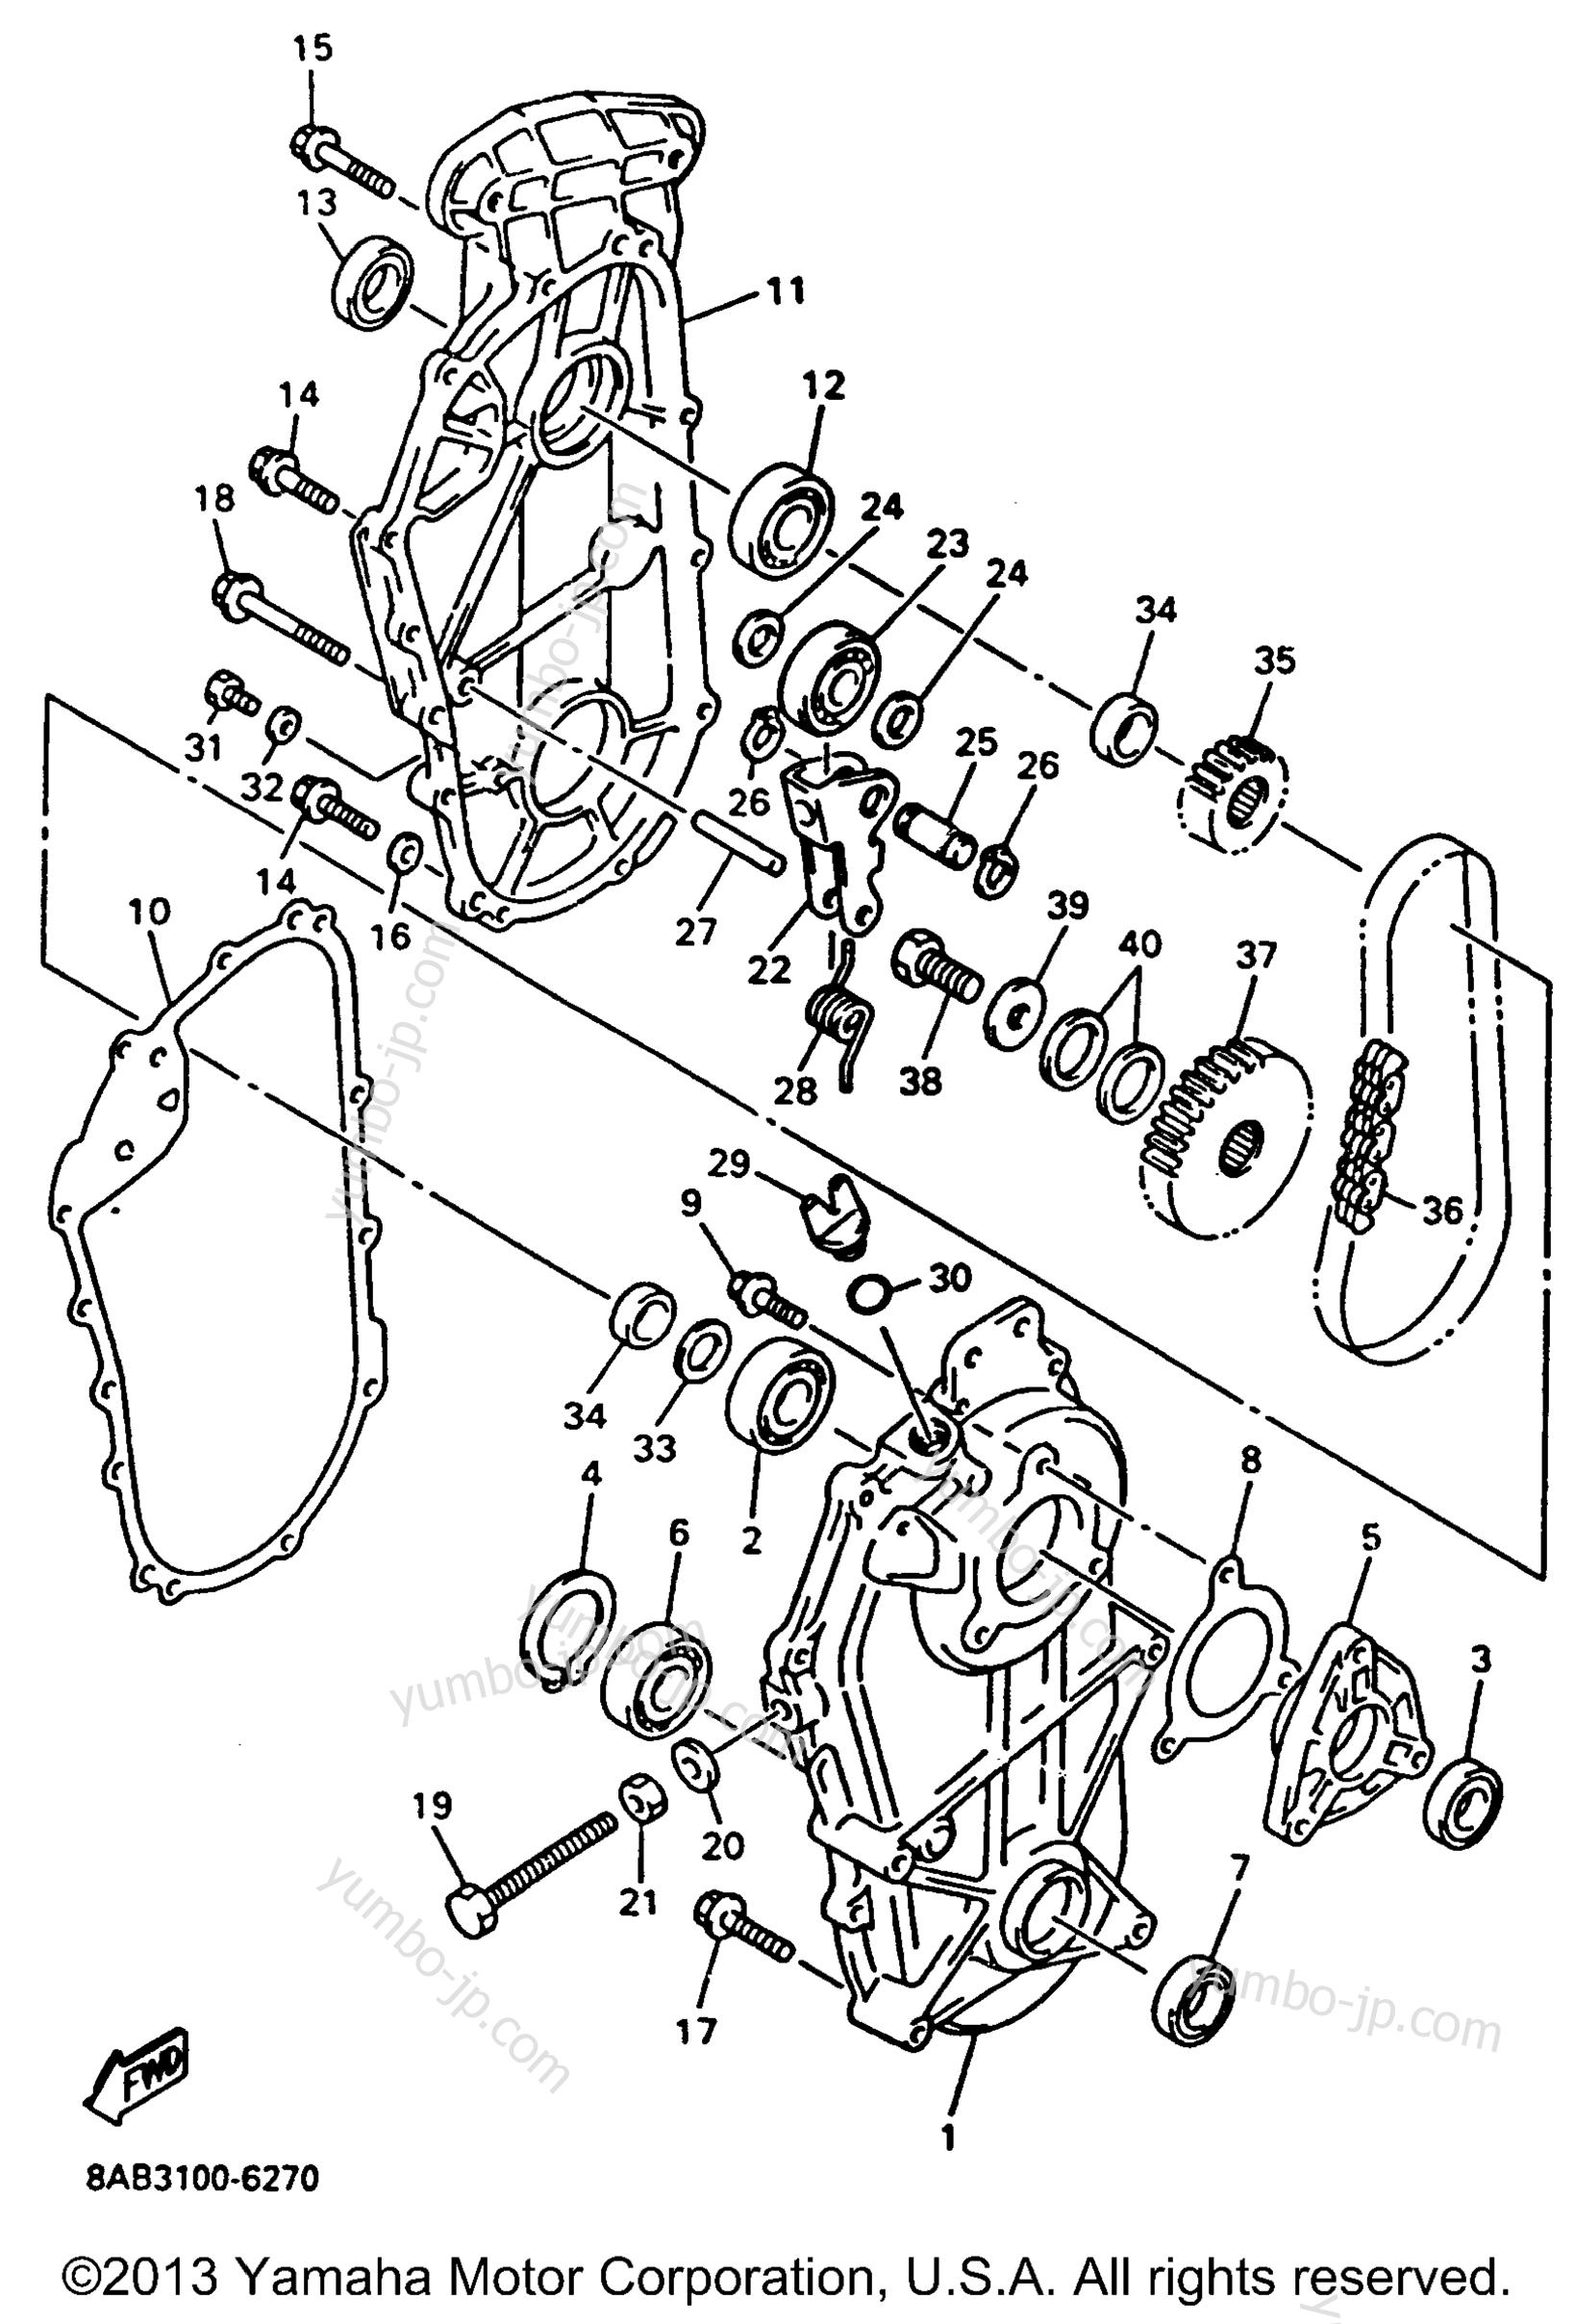 Track Drive 2 Yamaha Vmax 600 Xt Proaction Plus Engine Diagram